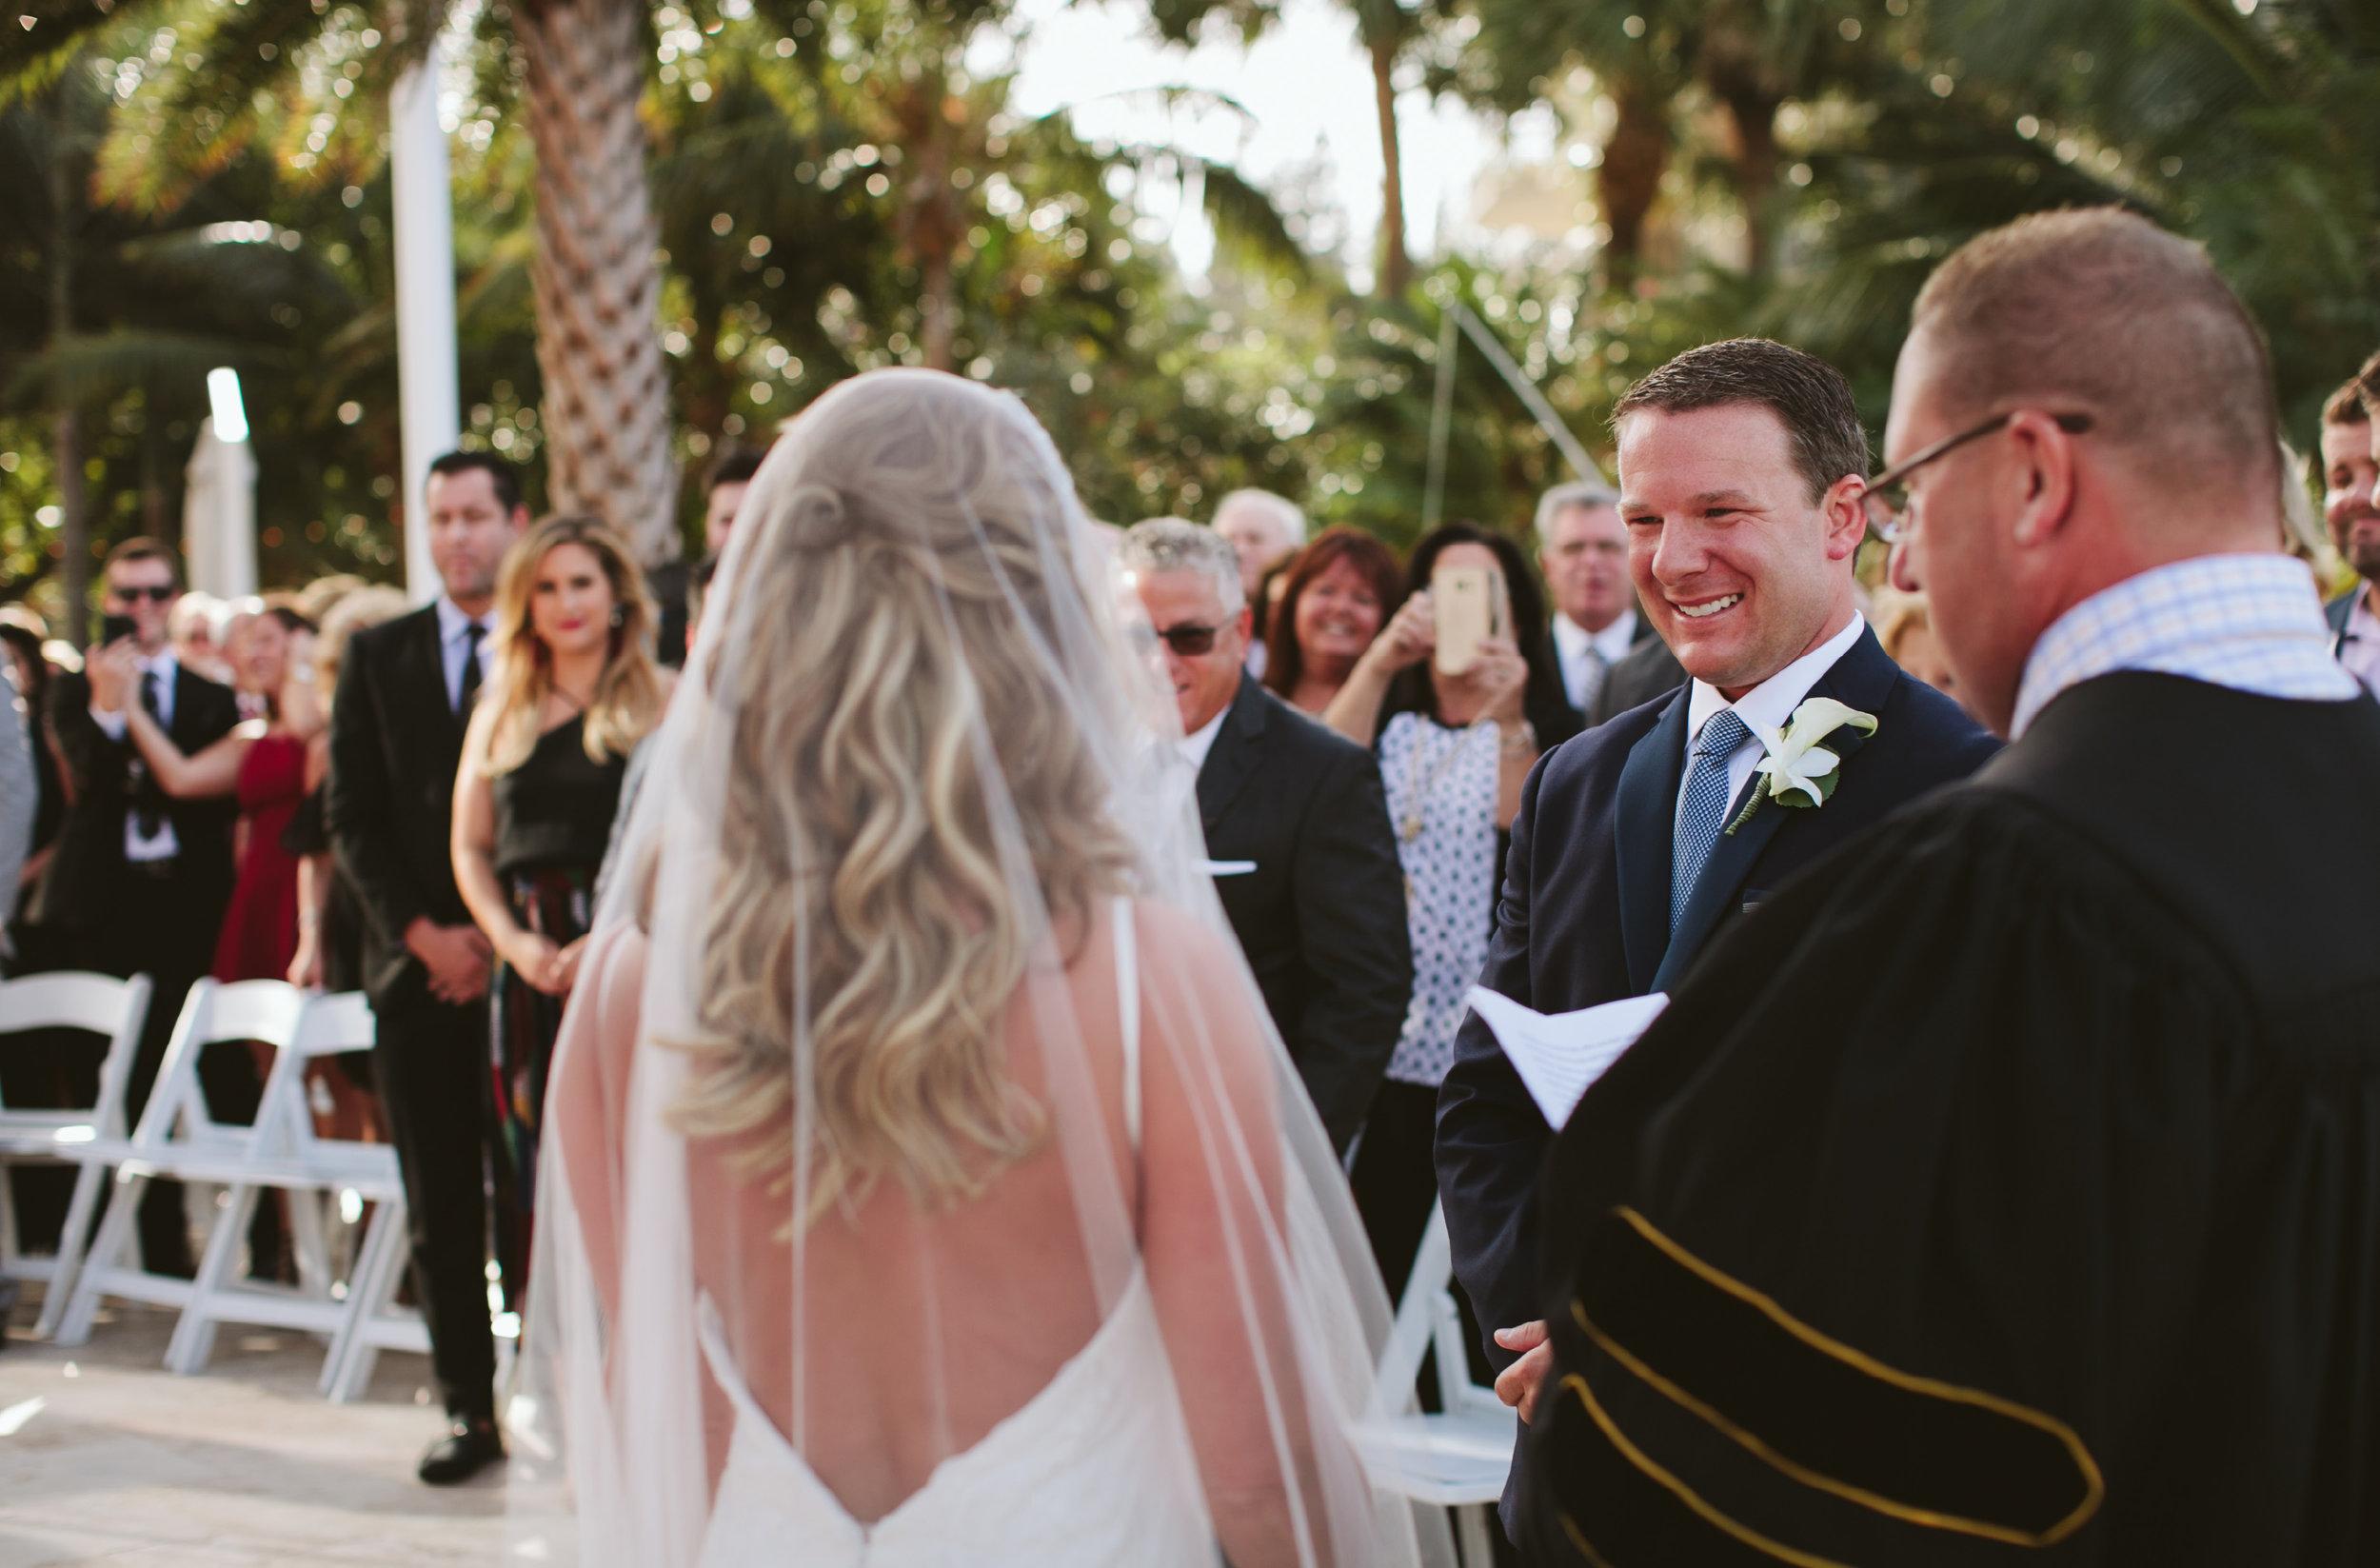 Kim + John's Wedding at the Waterstone Hotel in Boca Raton46.jpg